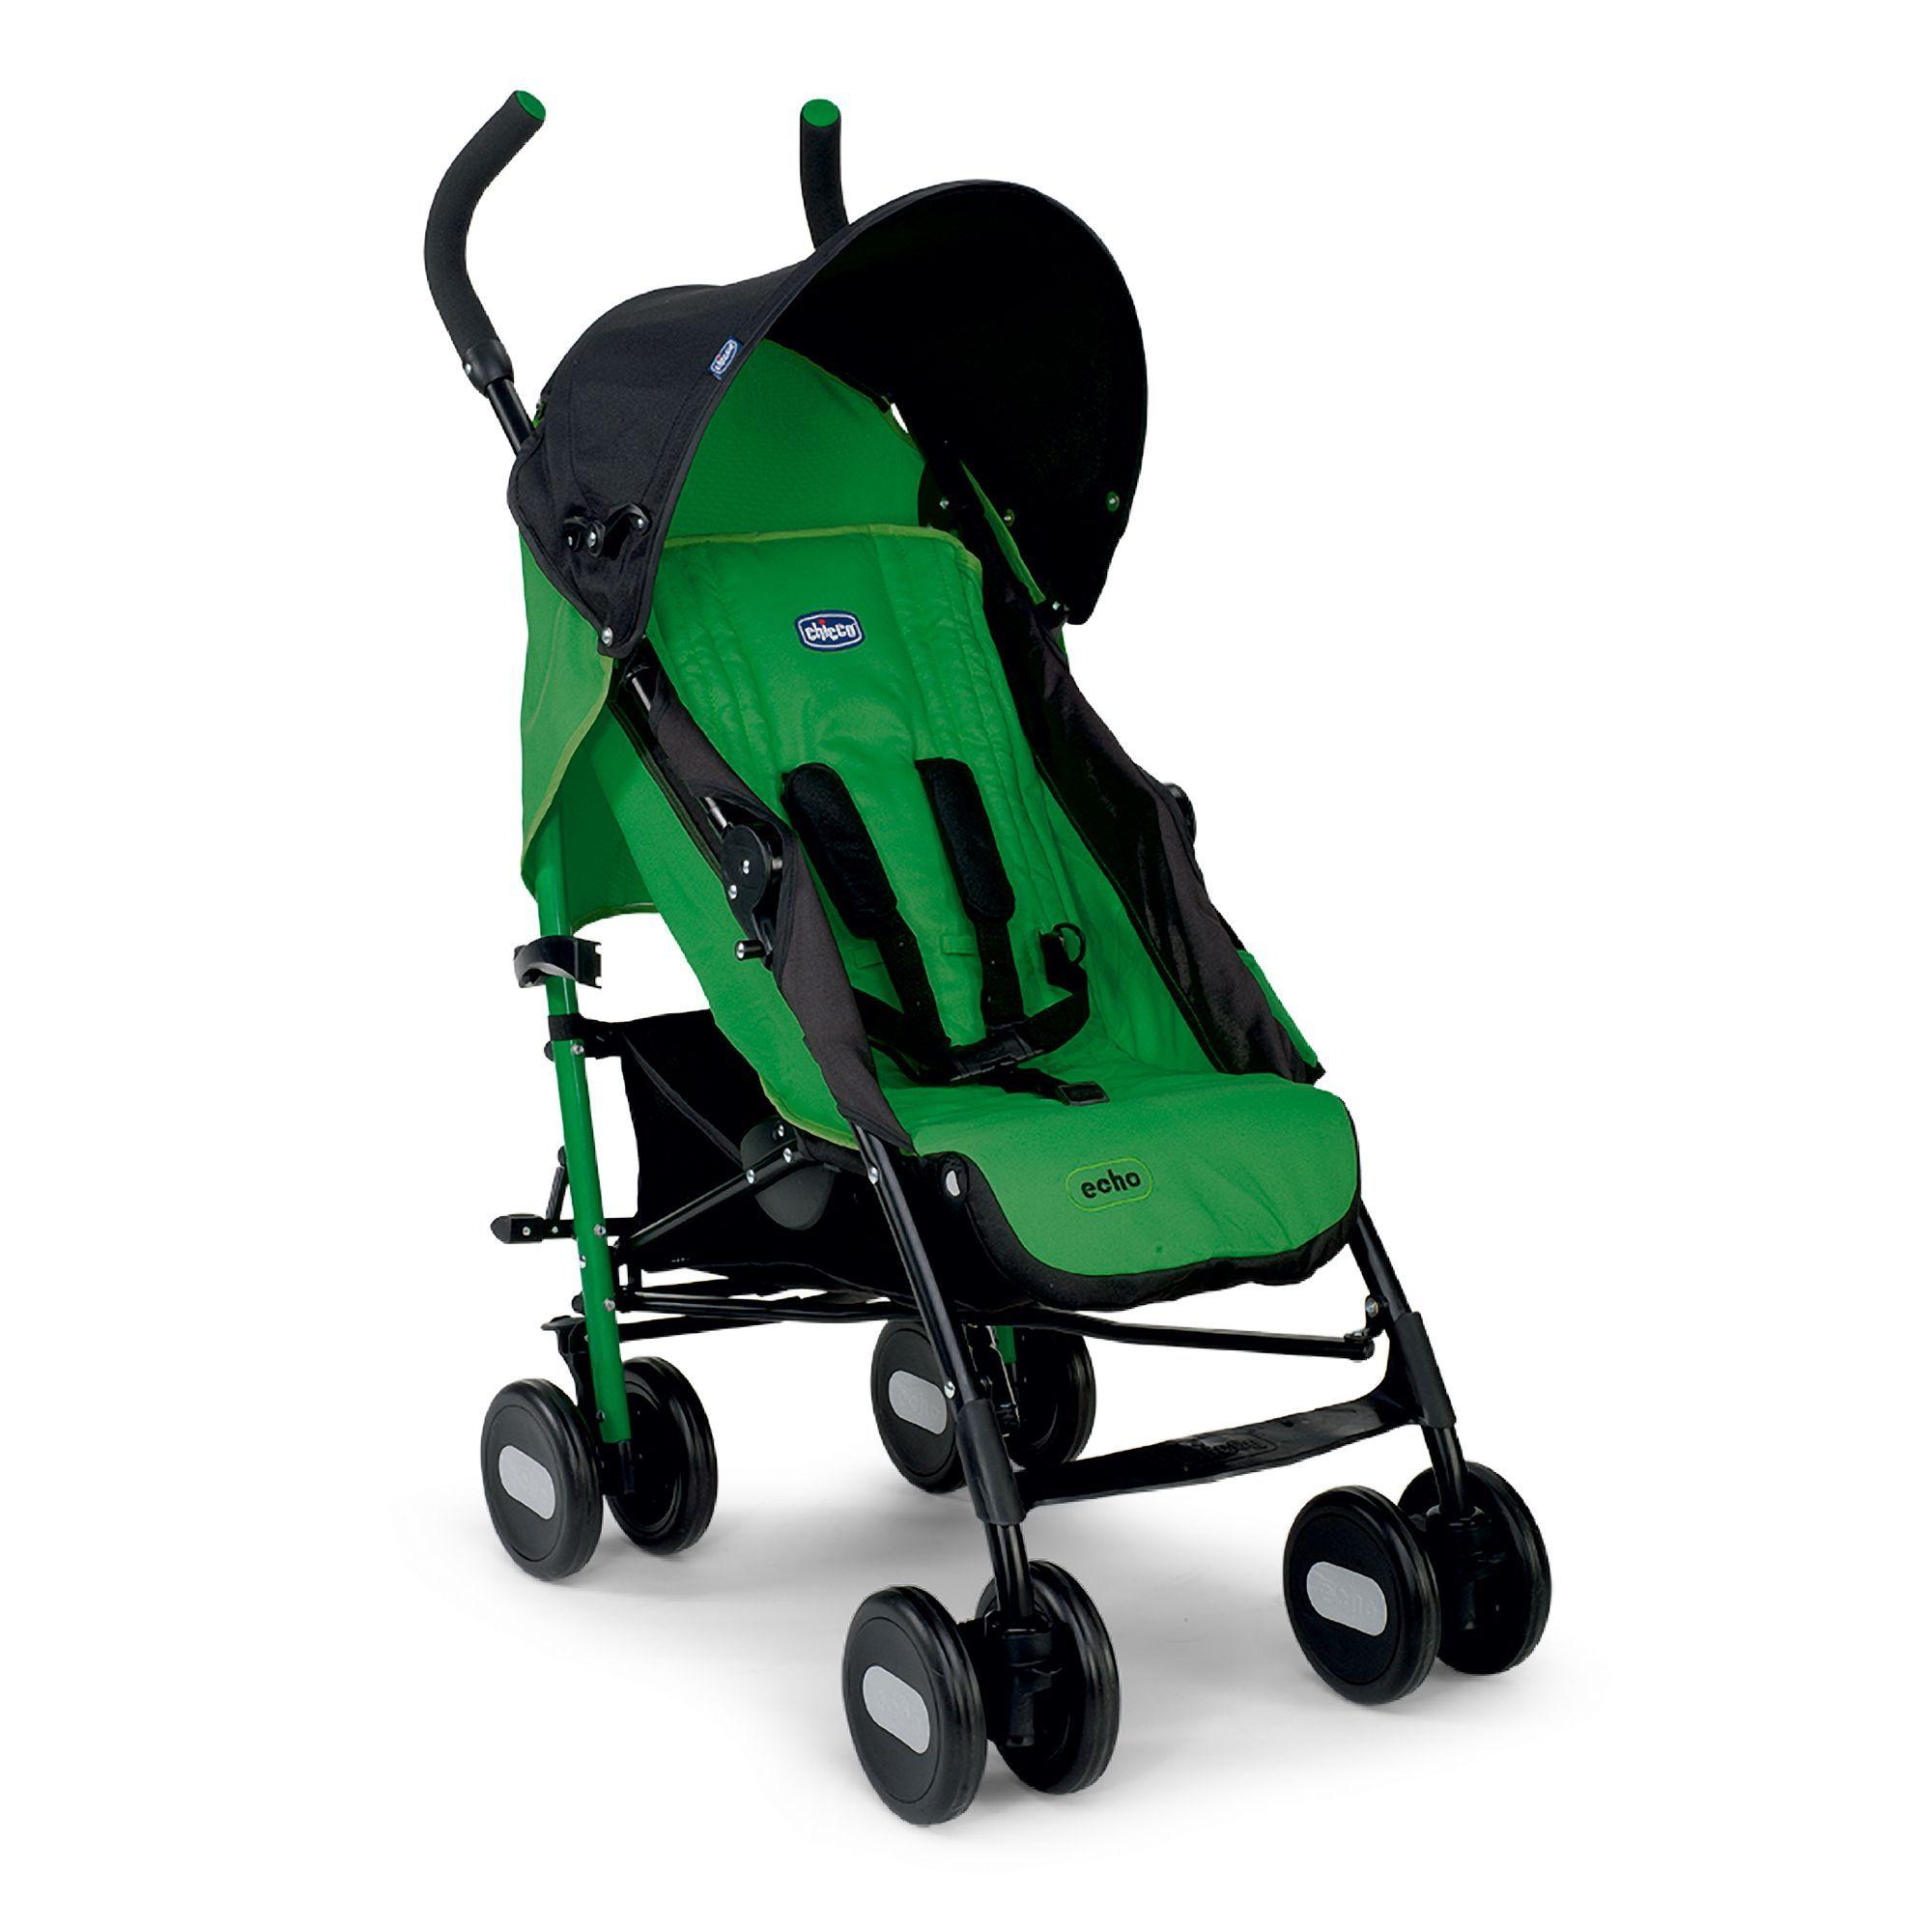 nursery bedding Baby strollers, Umbrella stroller, Baby